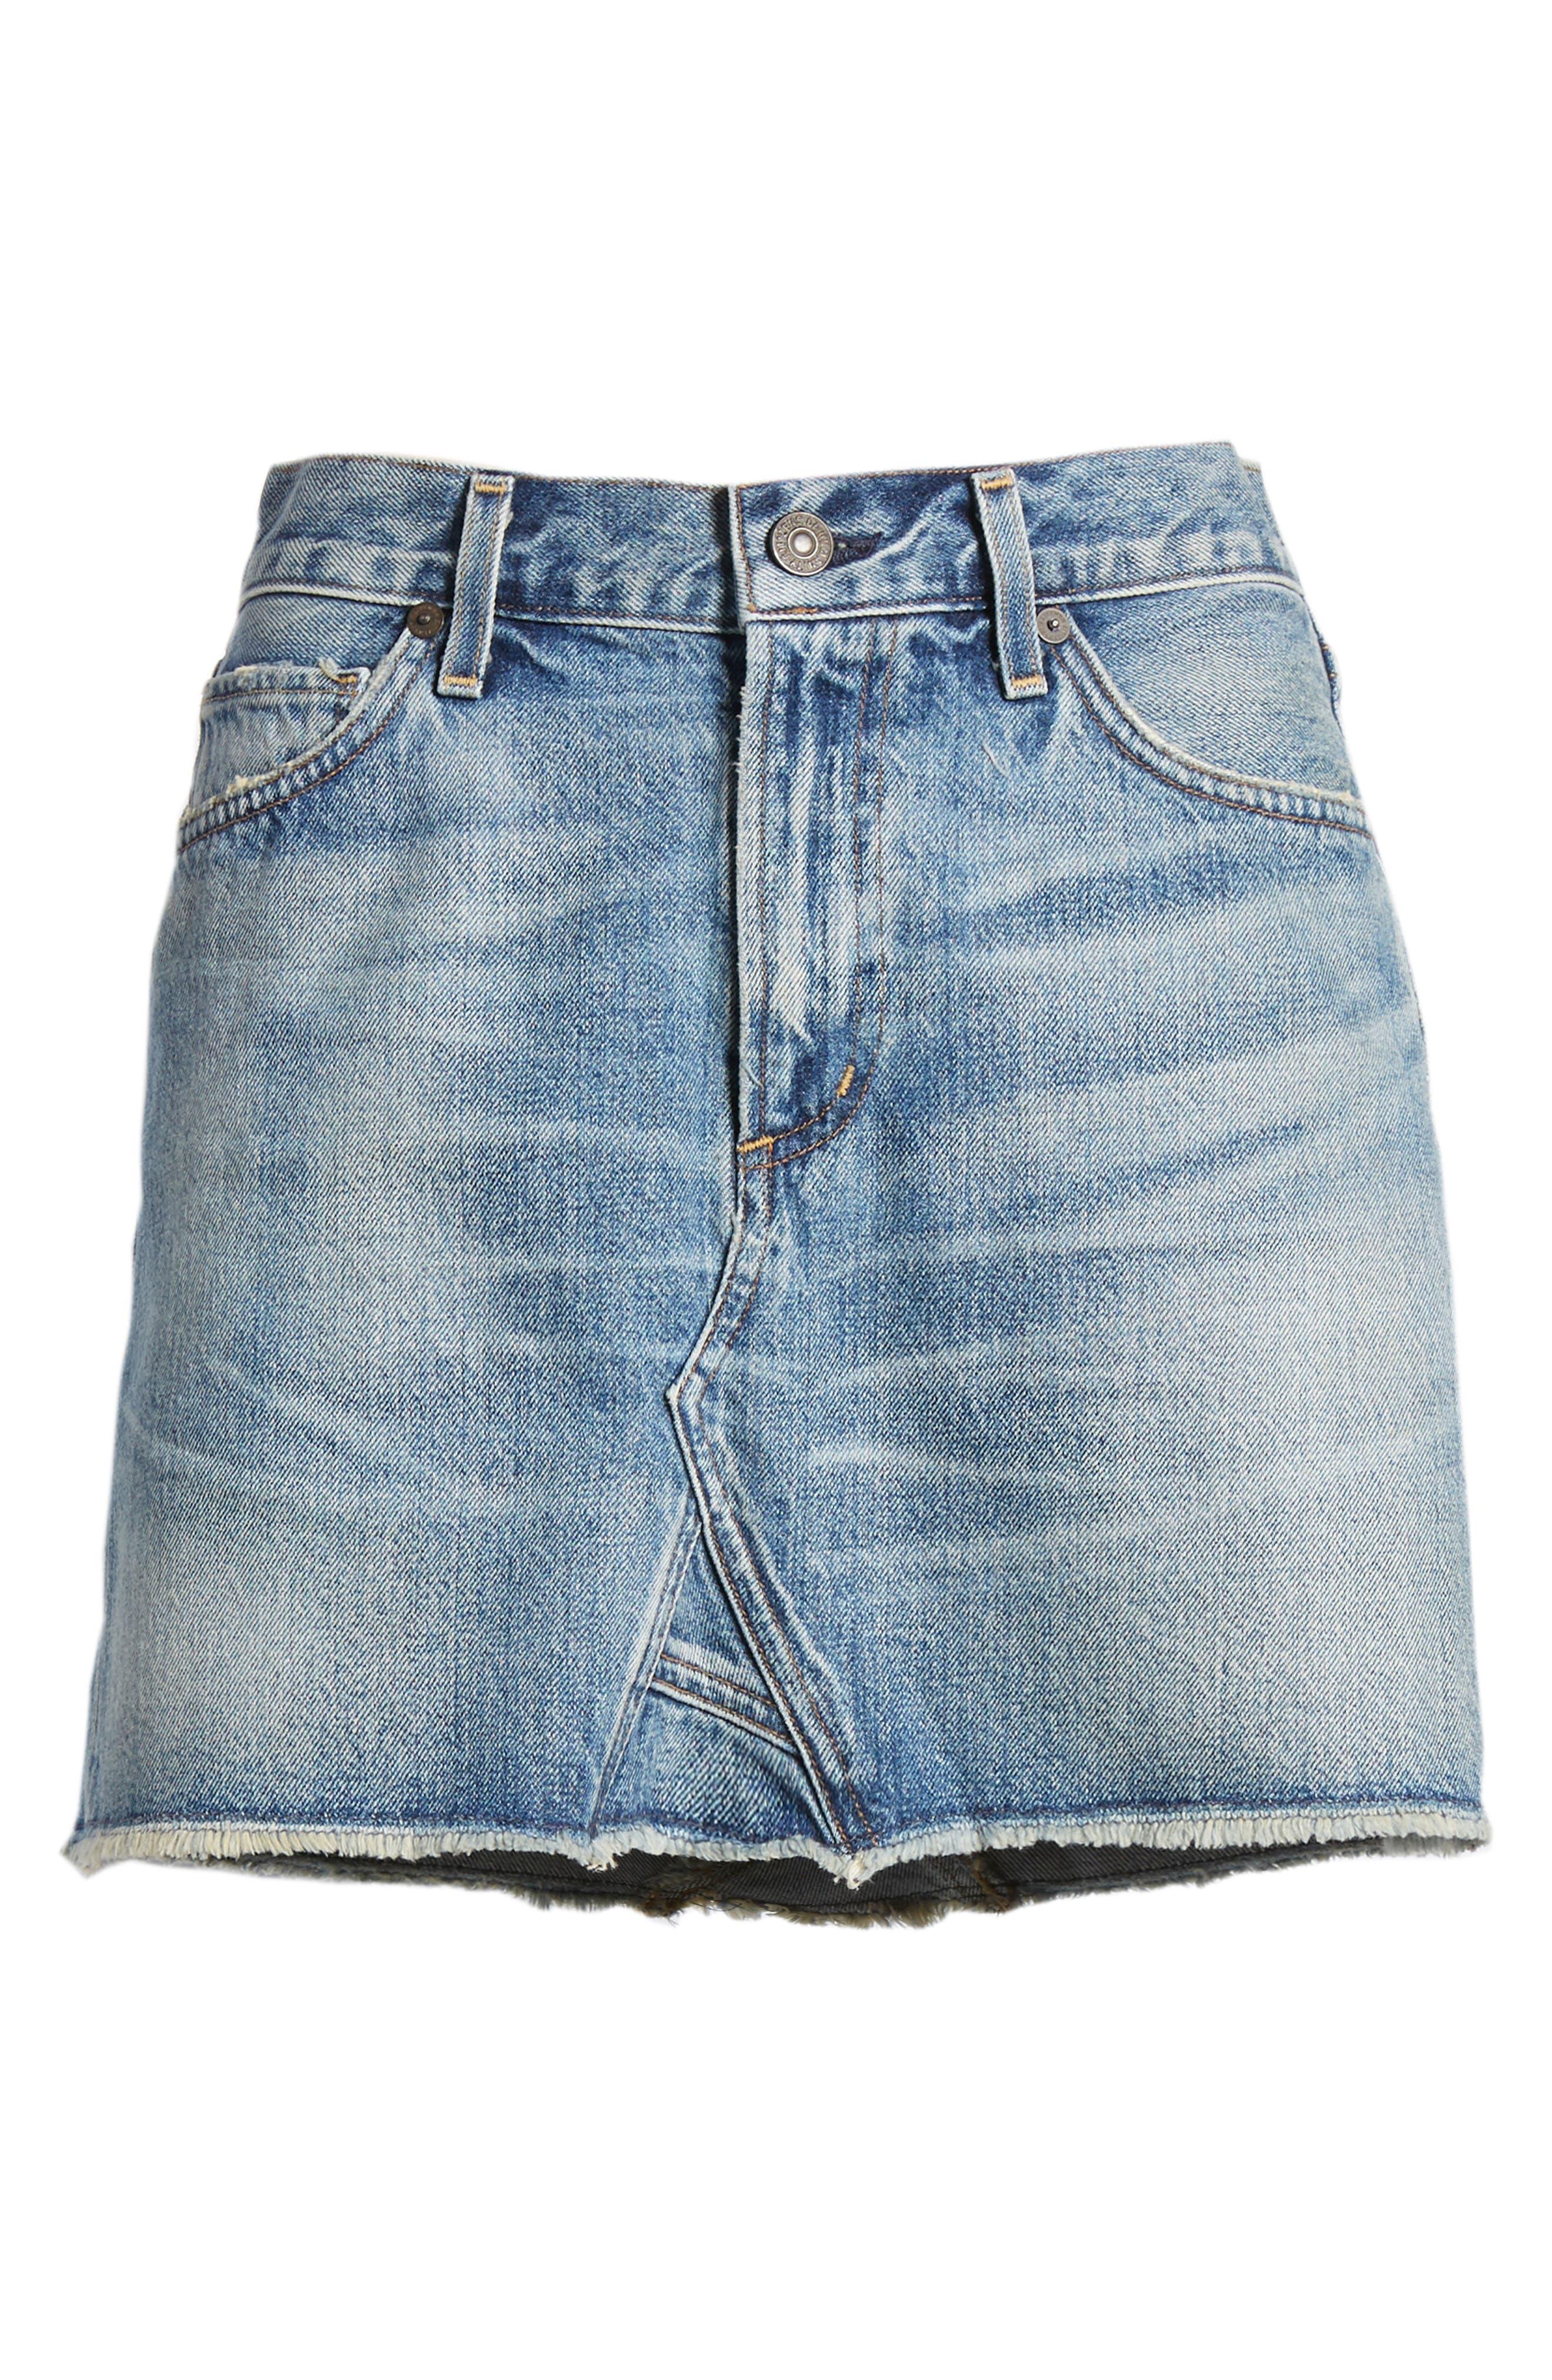 Cutoff Denim Miniskirt,                             Alternate thumbnail 7, color,                             Freebird